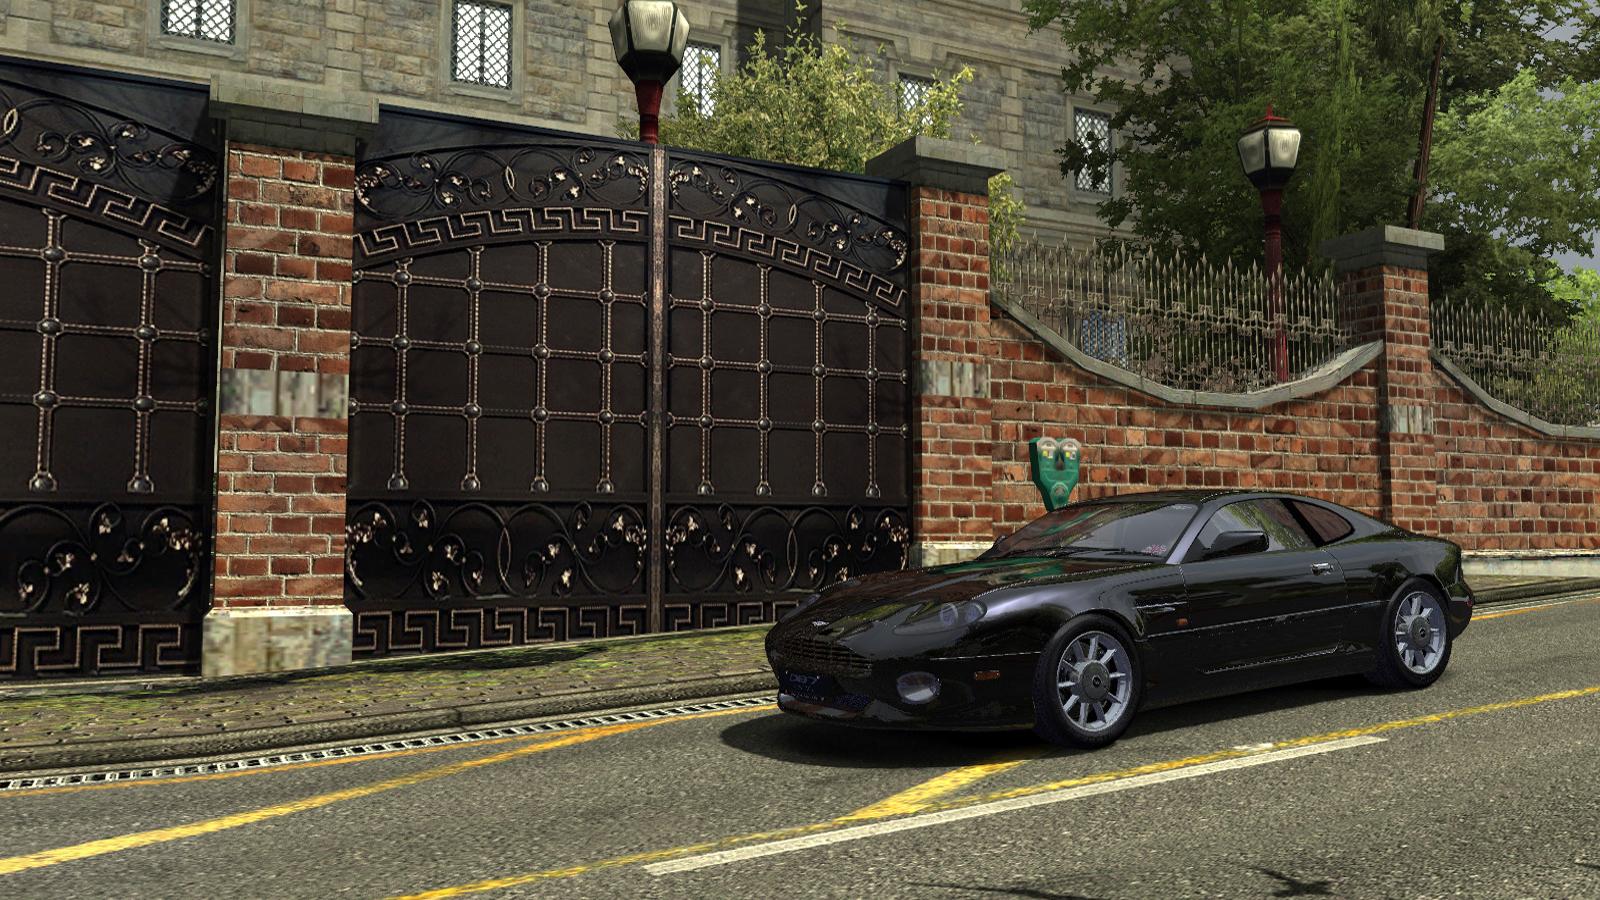 Speed 2020-01-12 20-15-08-289.jpg - Need for Speed: Most Wanted (2005) Aston Martin DB7 Vantage, Автомобиль